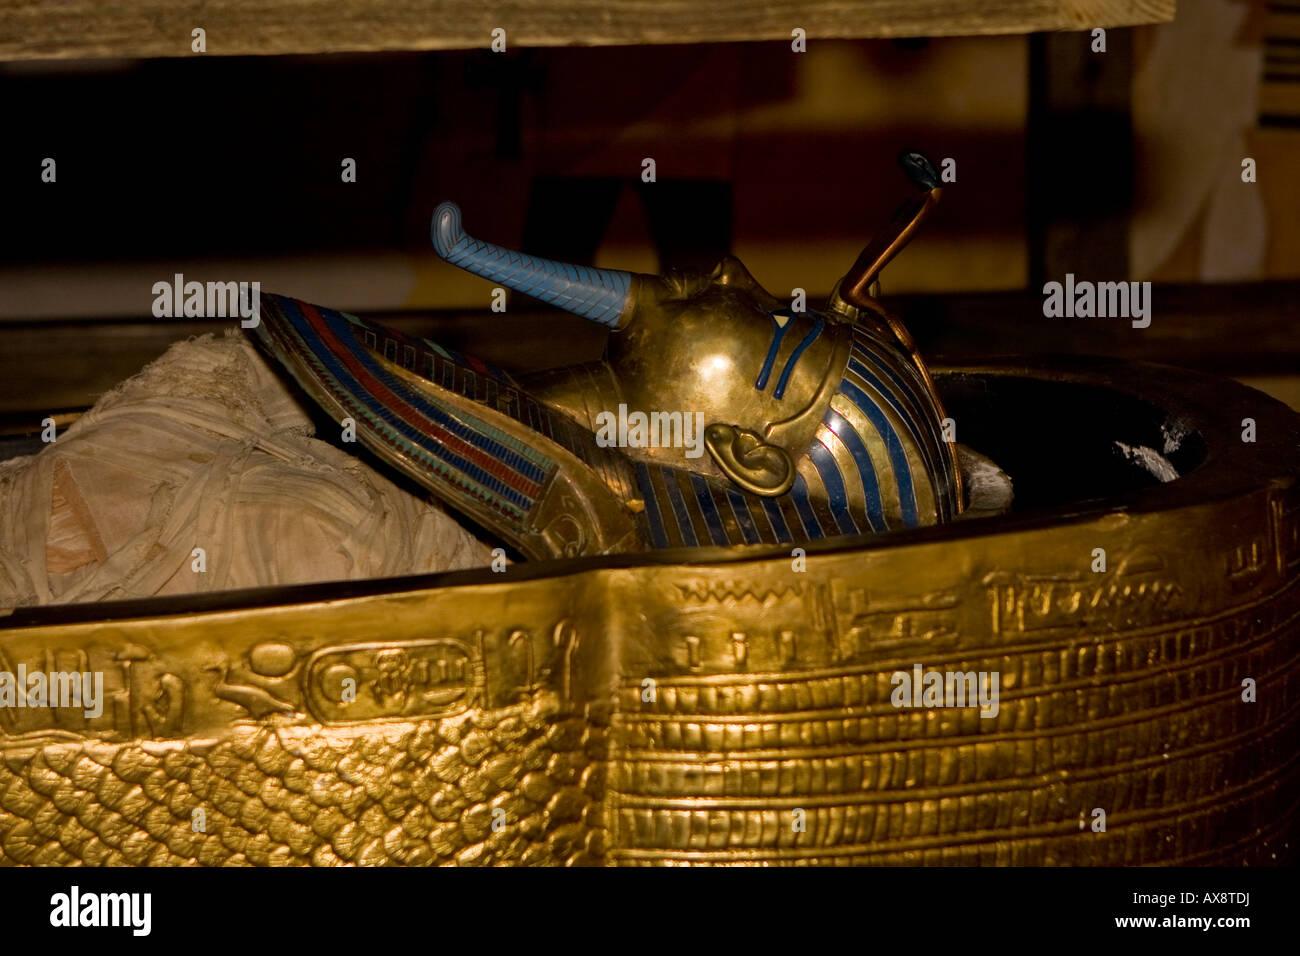 King Tut Sarcophagus Replica at Busch Gardens Florida USA - Stock Image